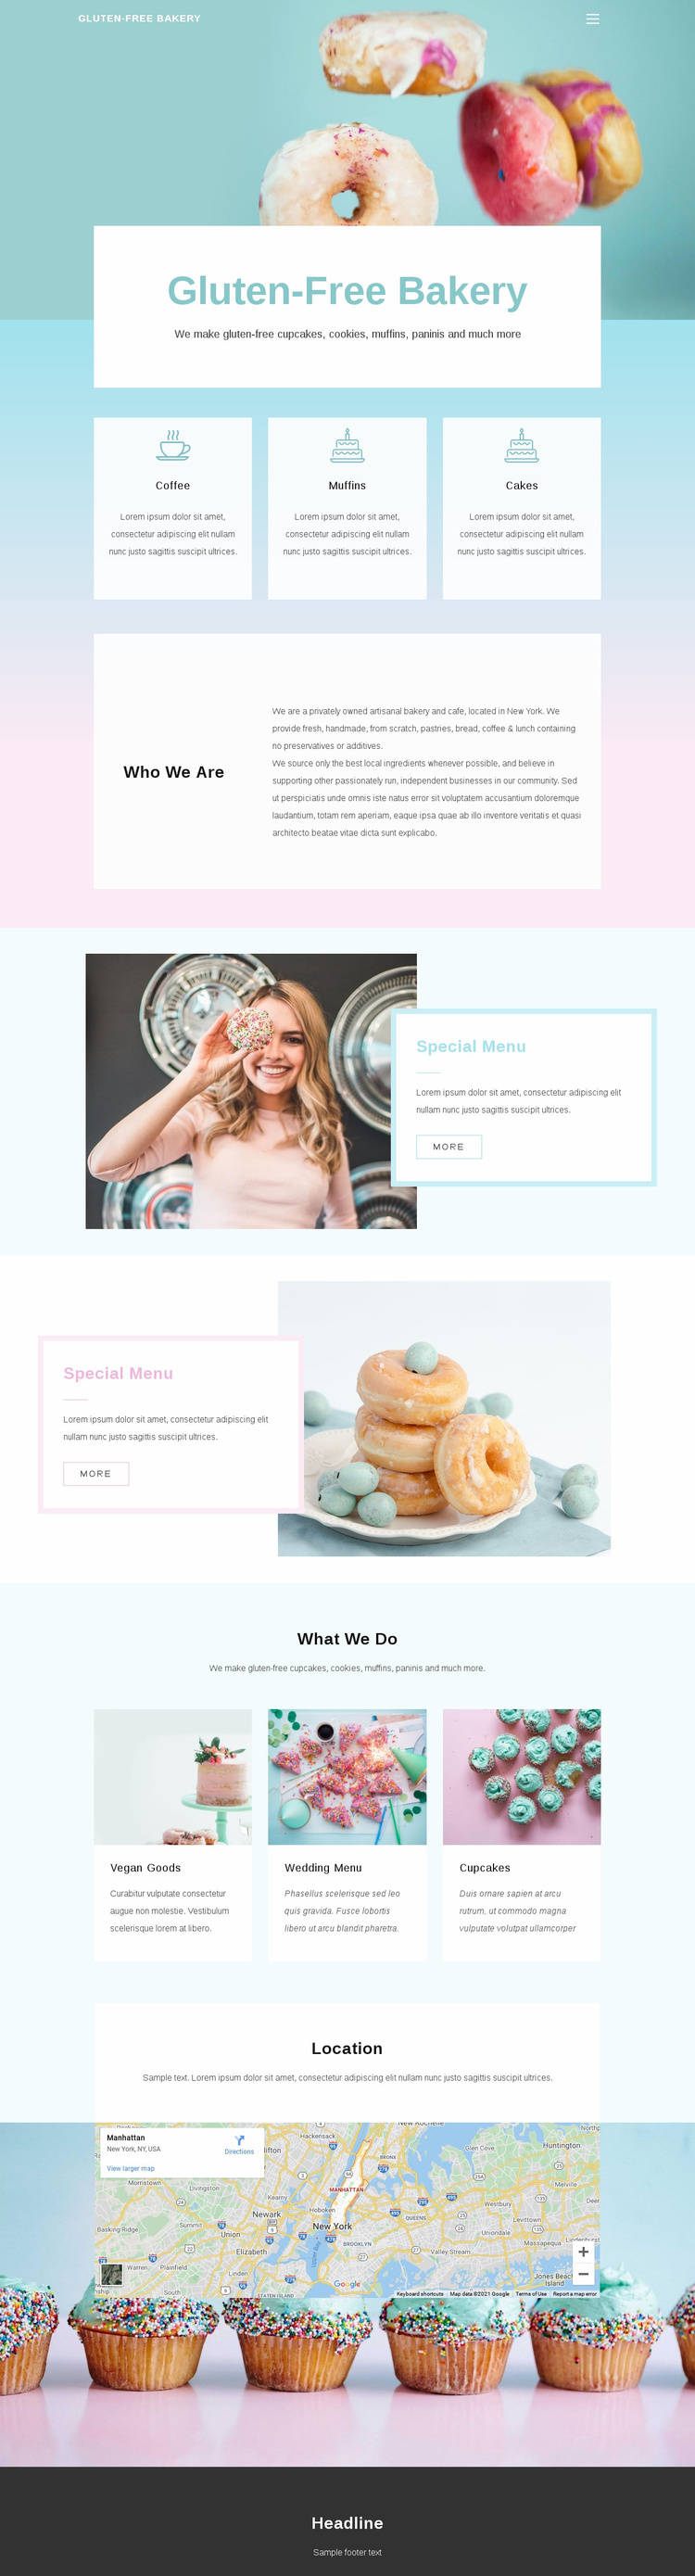 Gluten-Free Backery Landing Page